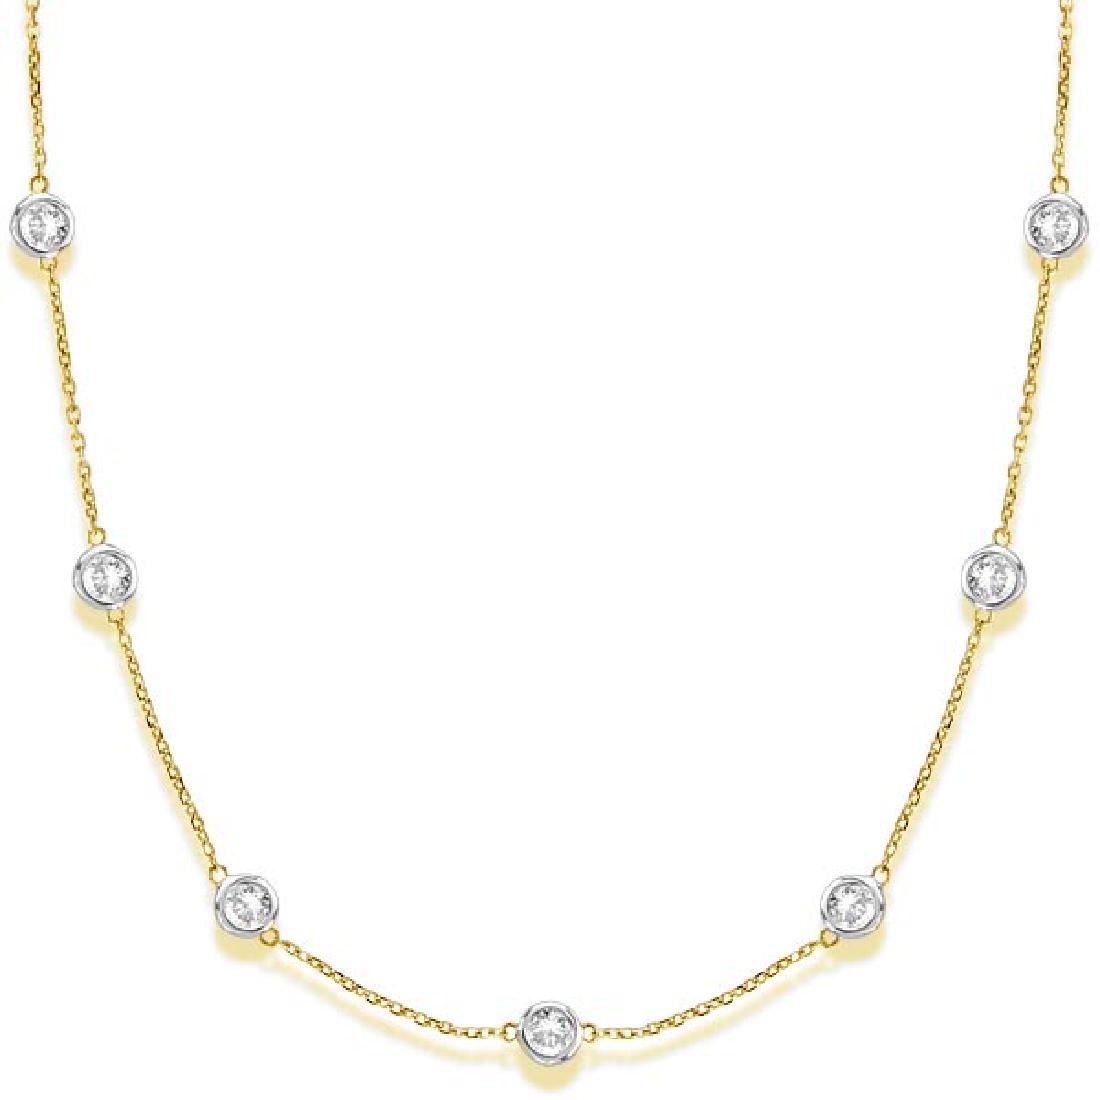 Diamonds by The Yard Bezel-Set Necklace in 14k Two Tone